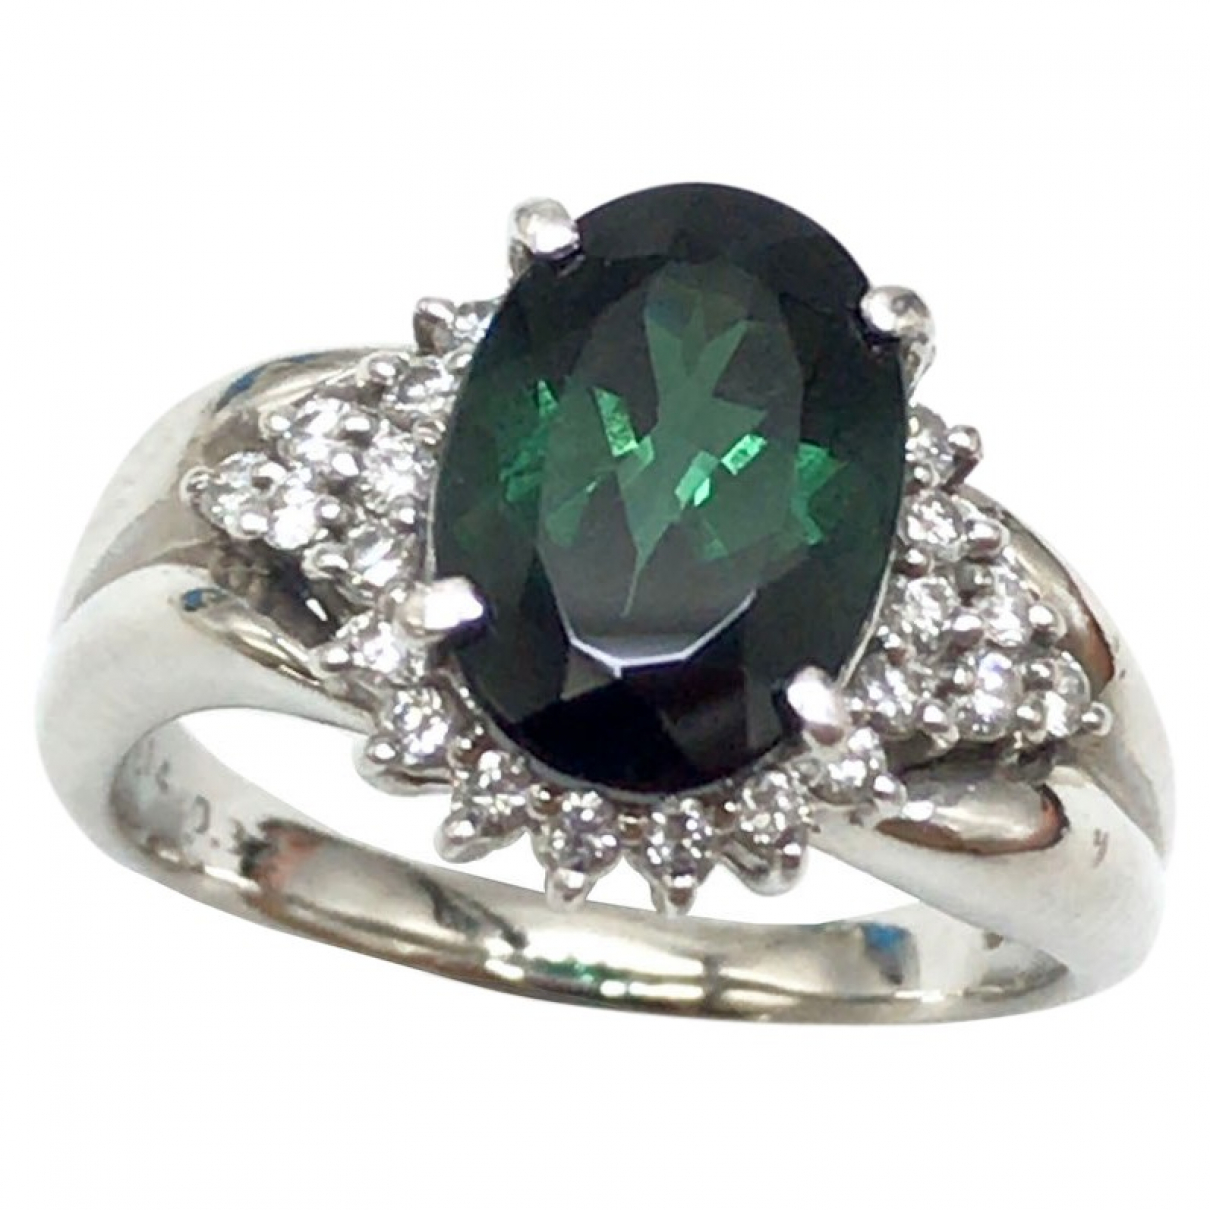 Non Signe / Unsigned Emeraude Ring in Platin